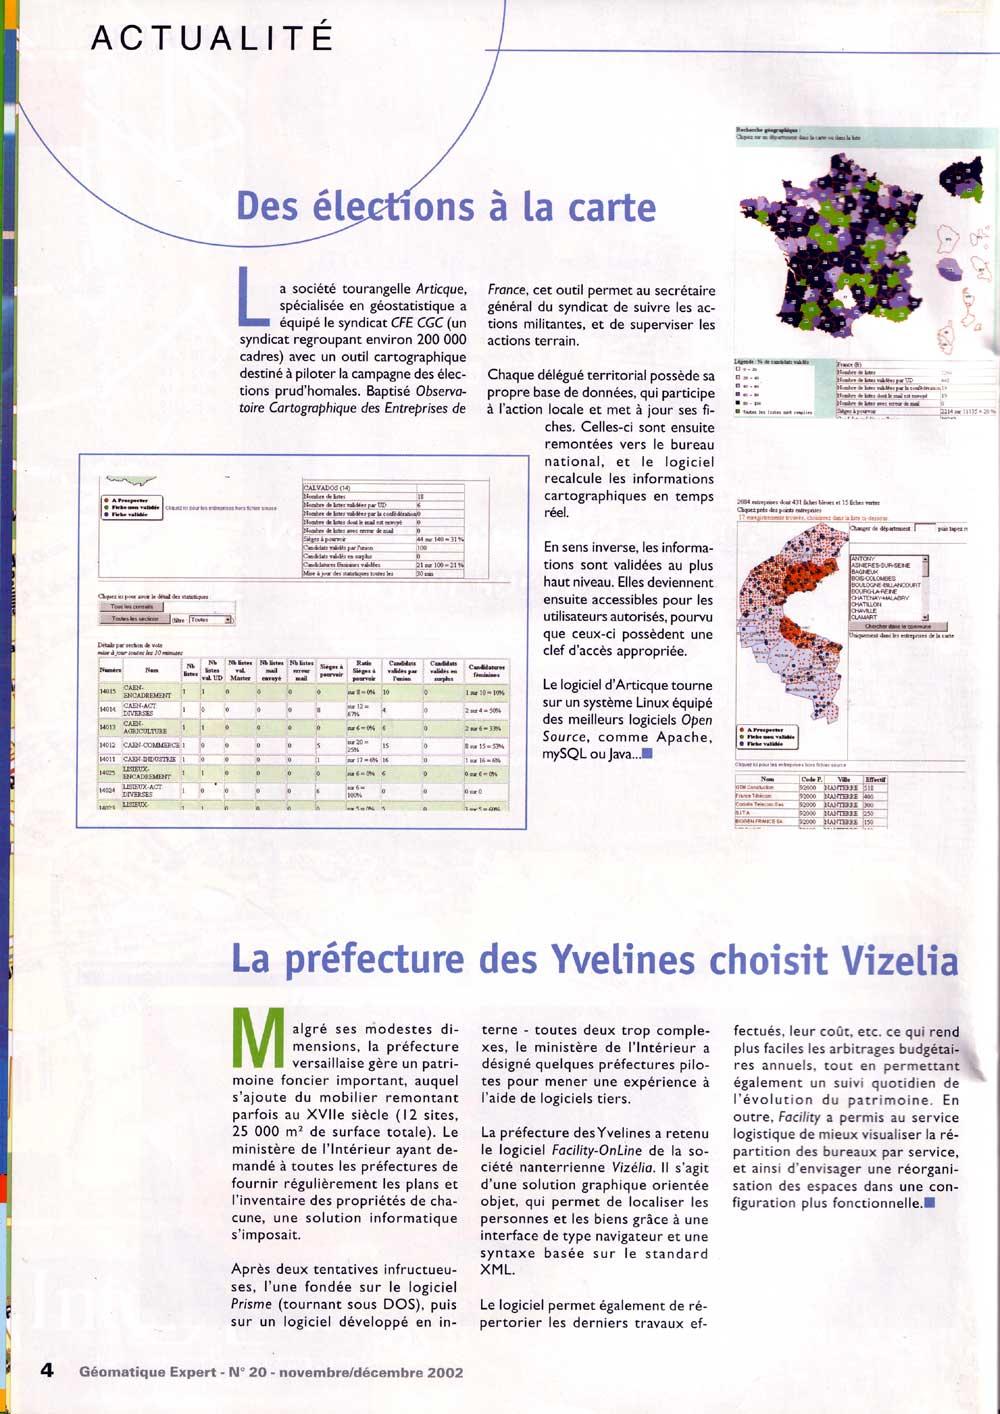 geomatiqueExpertN20